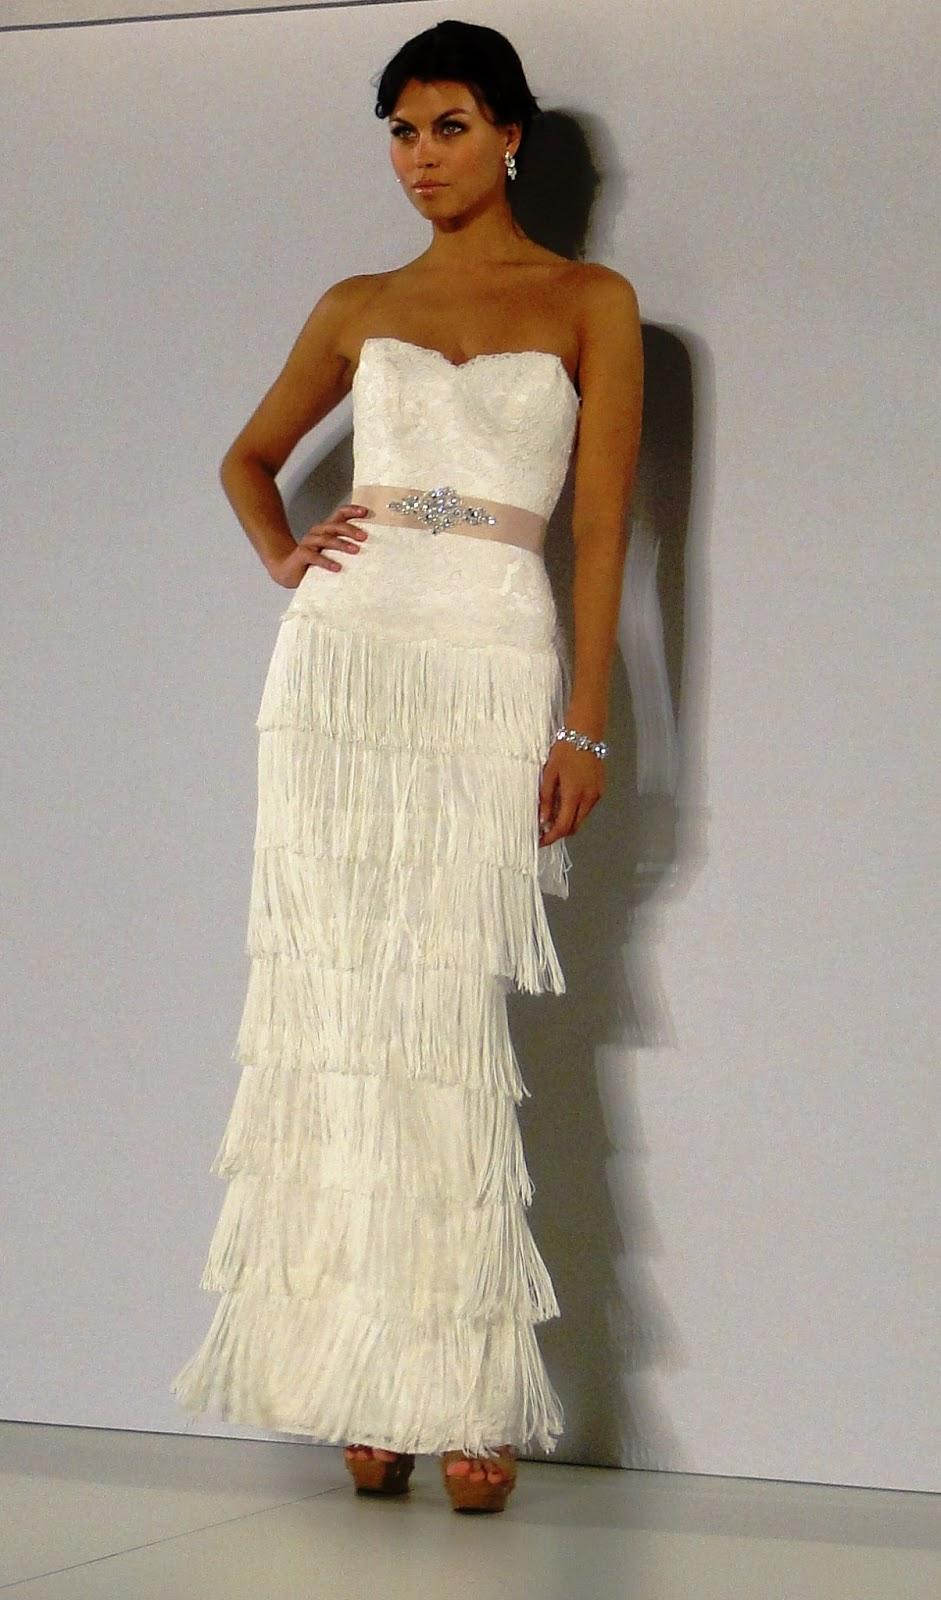 Trinidad Weddings.com Blog: Inspirations for a Great Gatsby-Themed ...